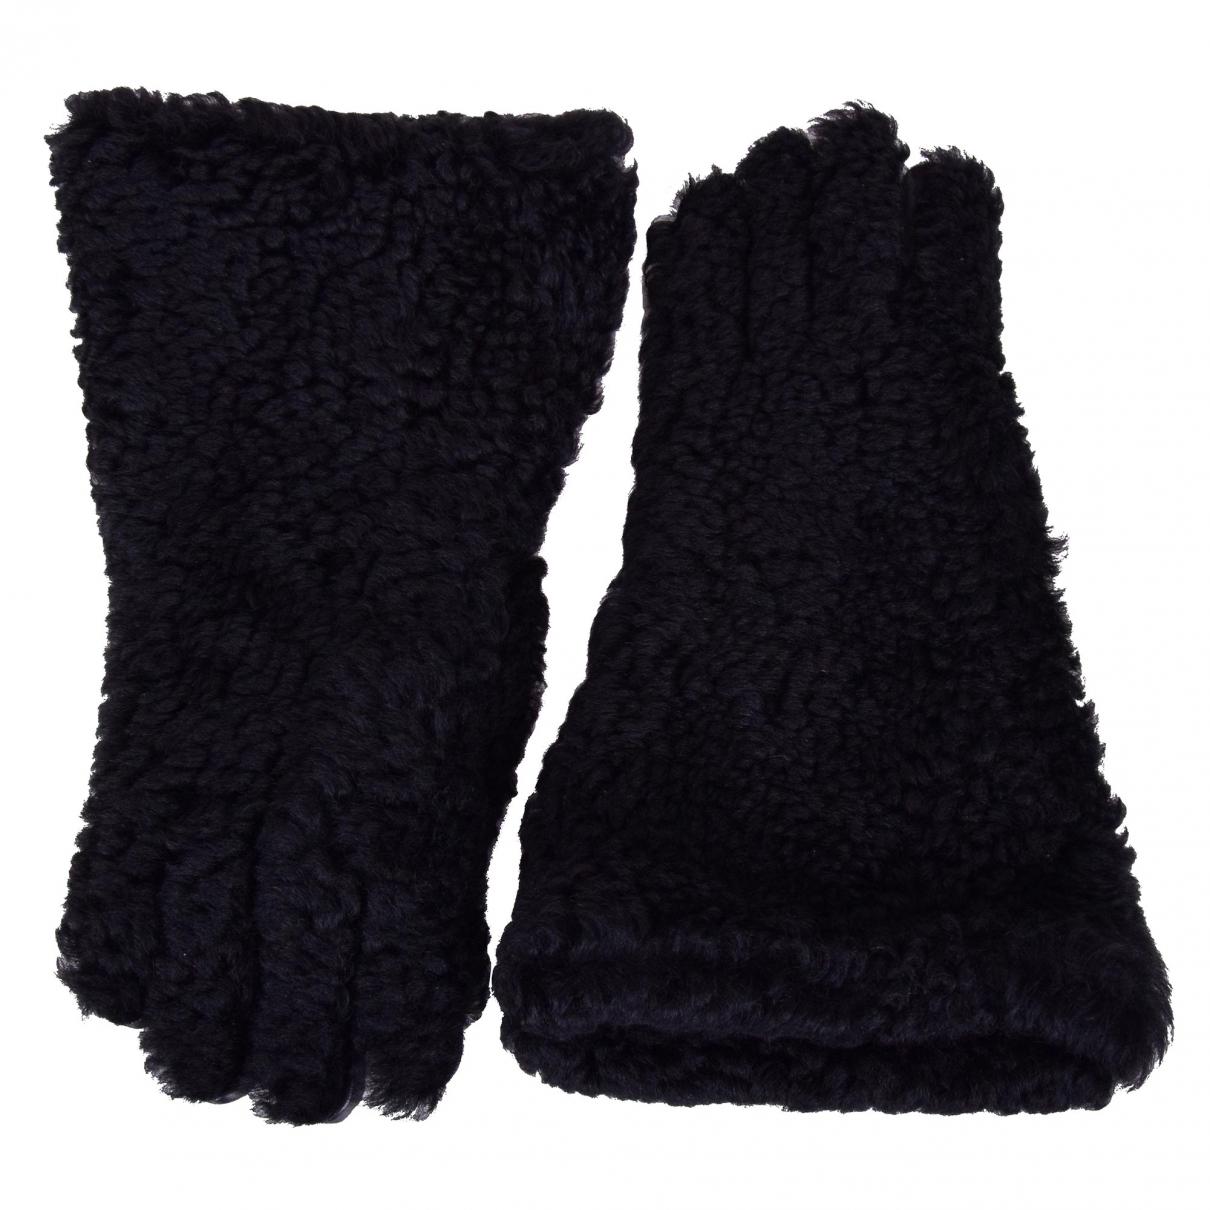 Dolce & Gabbana \N Black Fur Gloves for Men 8.5 - 9 Inches